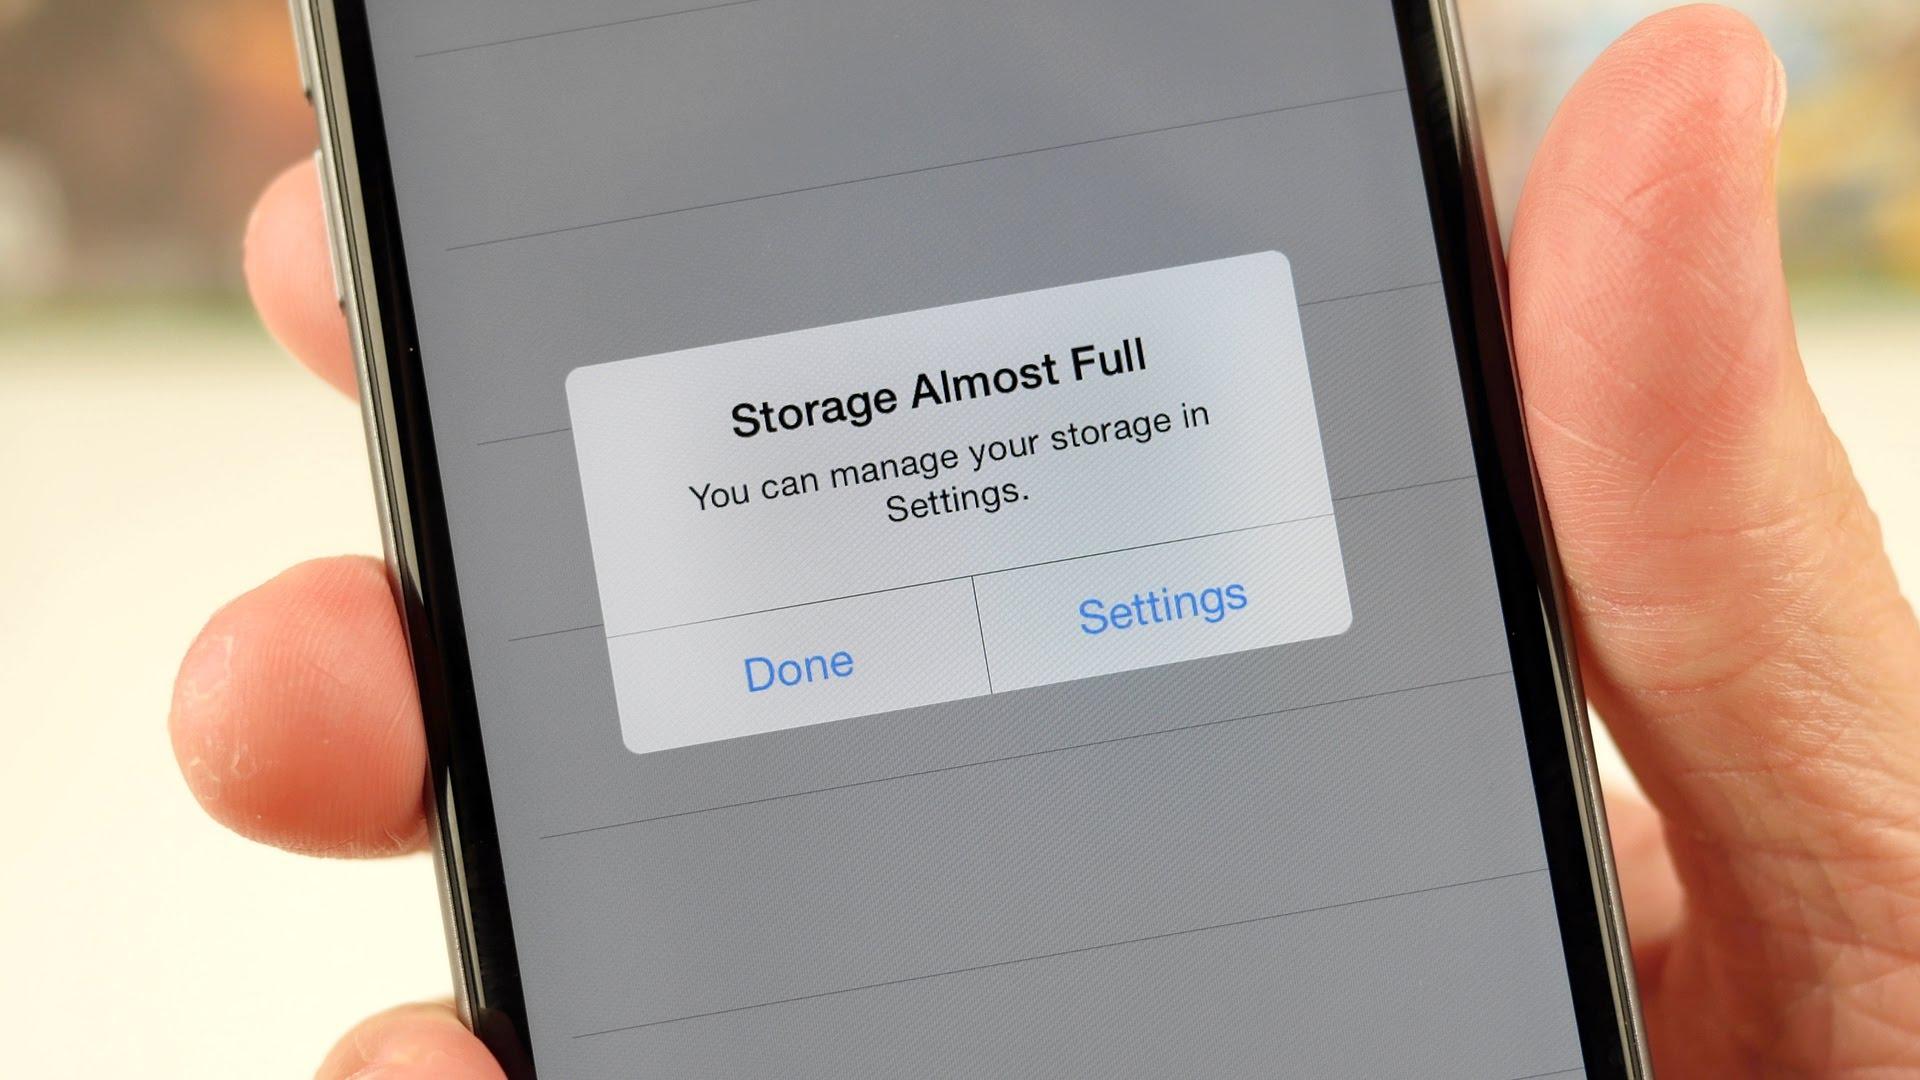 Pengguna smartphone di Indonesia sering kehilangan data, kenapa? - Medcom.id